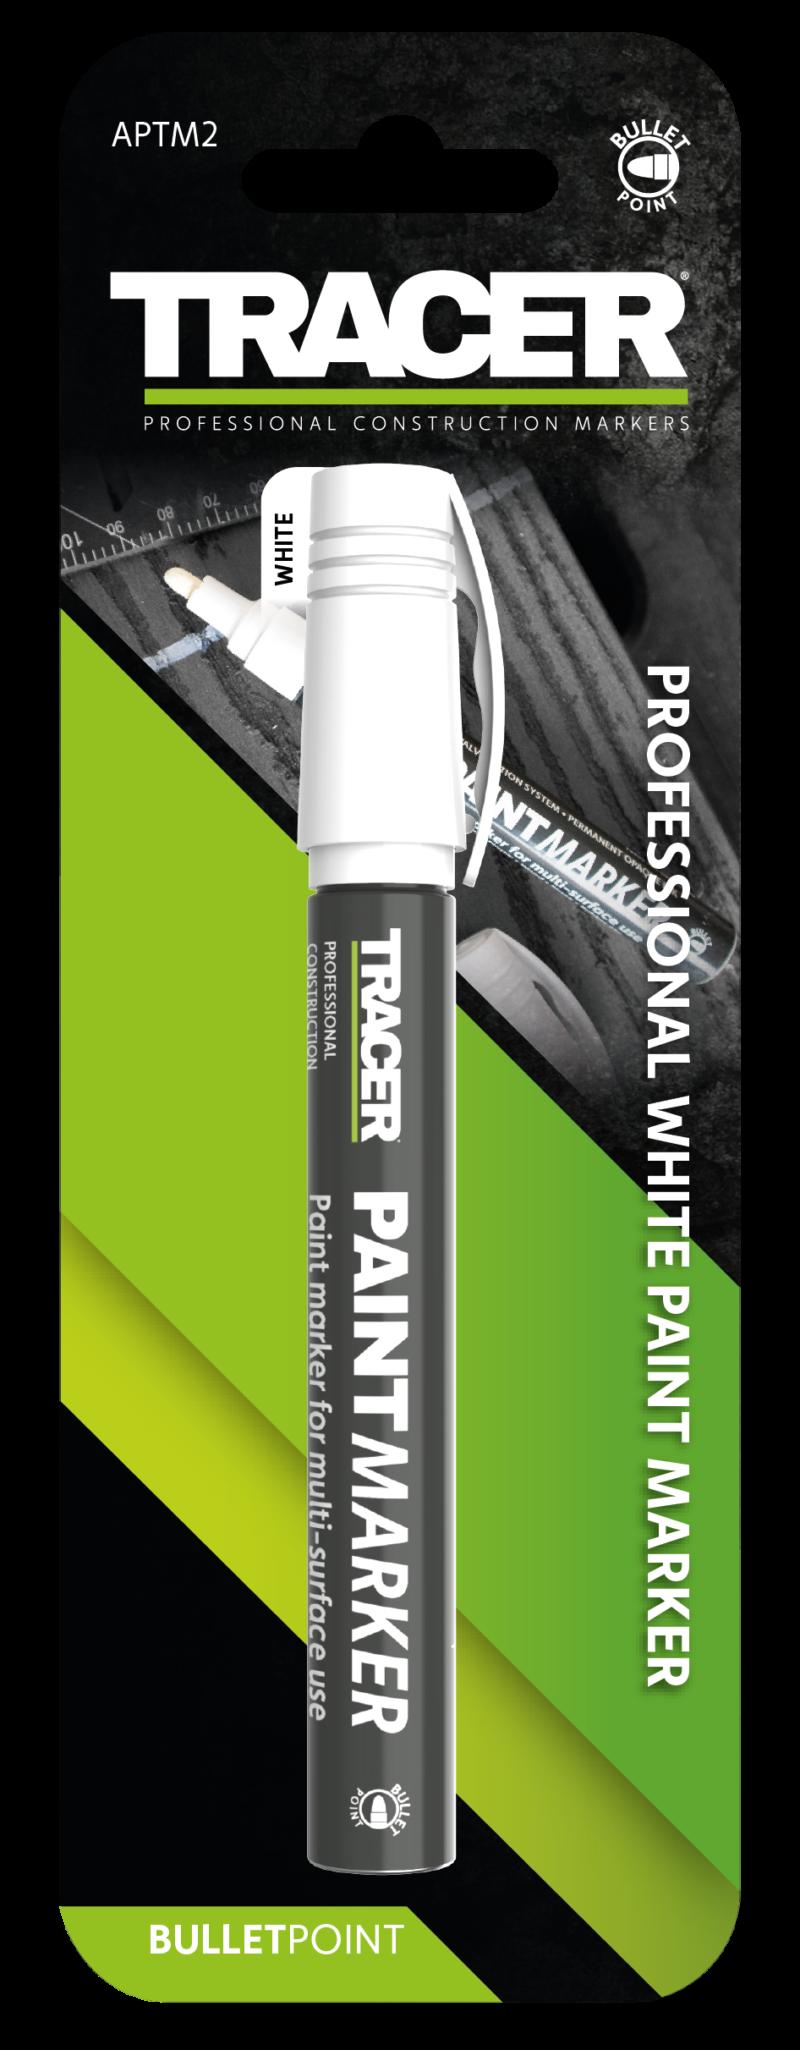 Tracer white paint marker 1 - 3mm bullet tipped marker